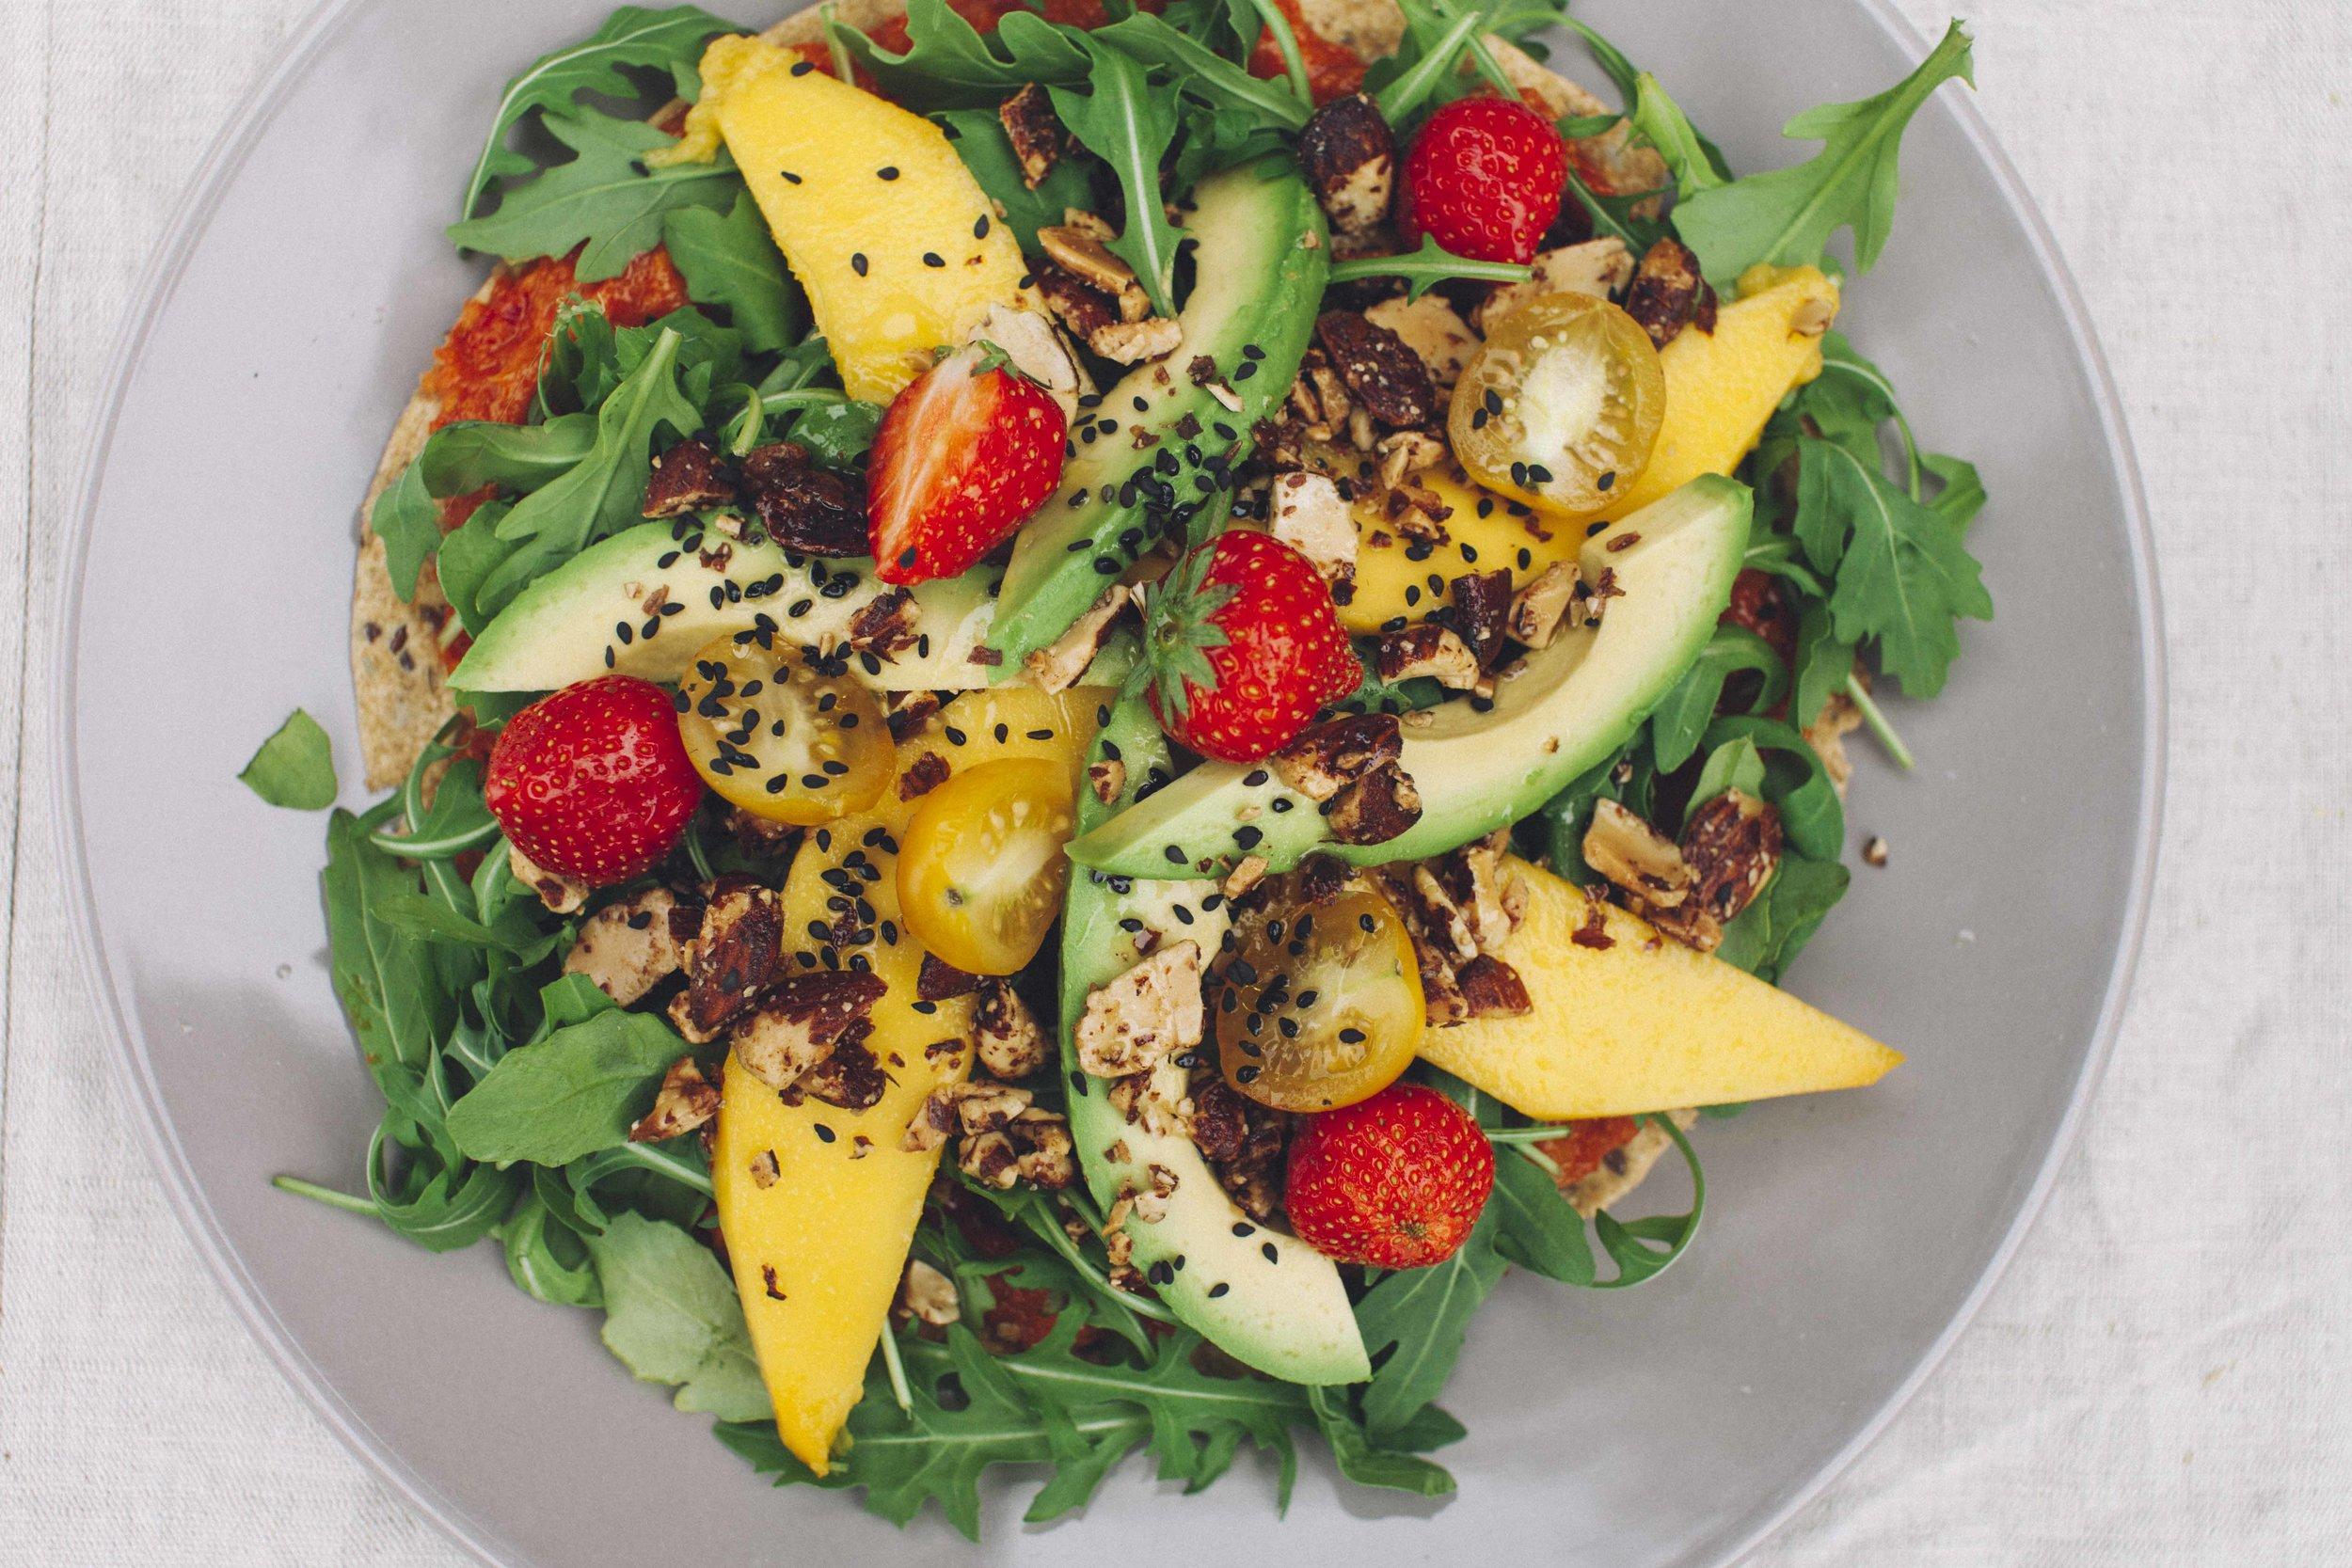 Light Bag - - Breakfast- Deatox Juice- Soup- Light Salad- Snack